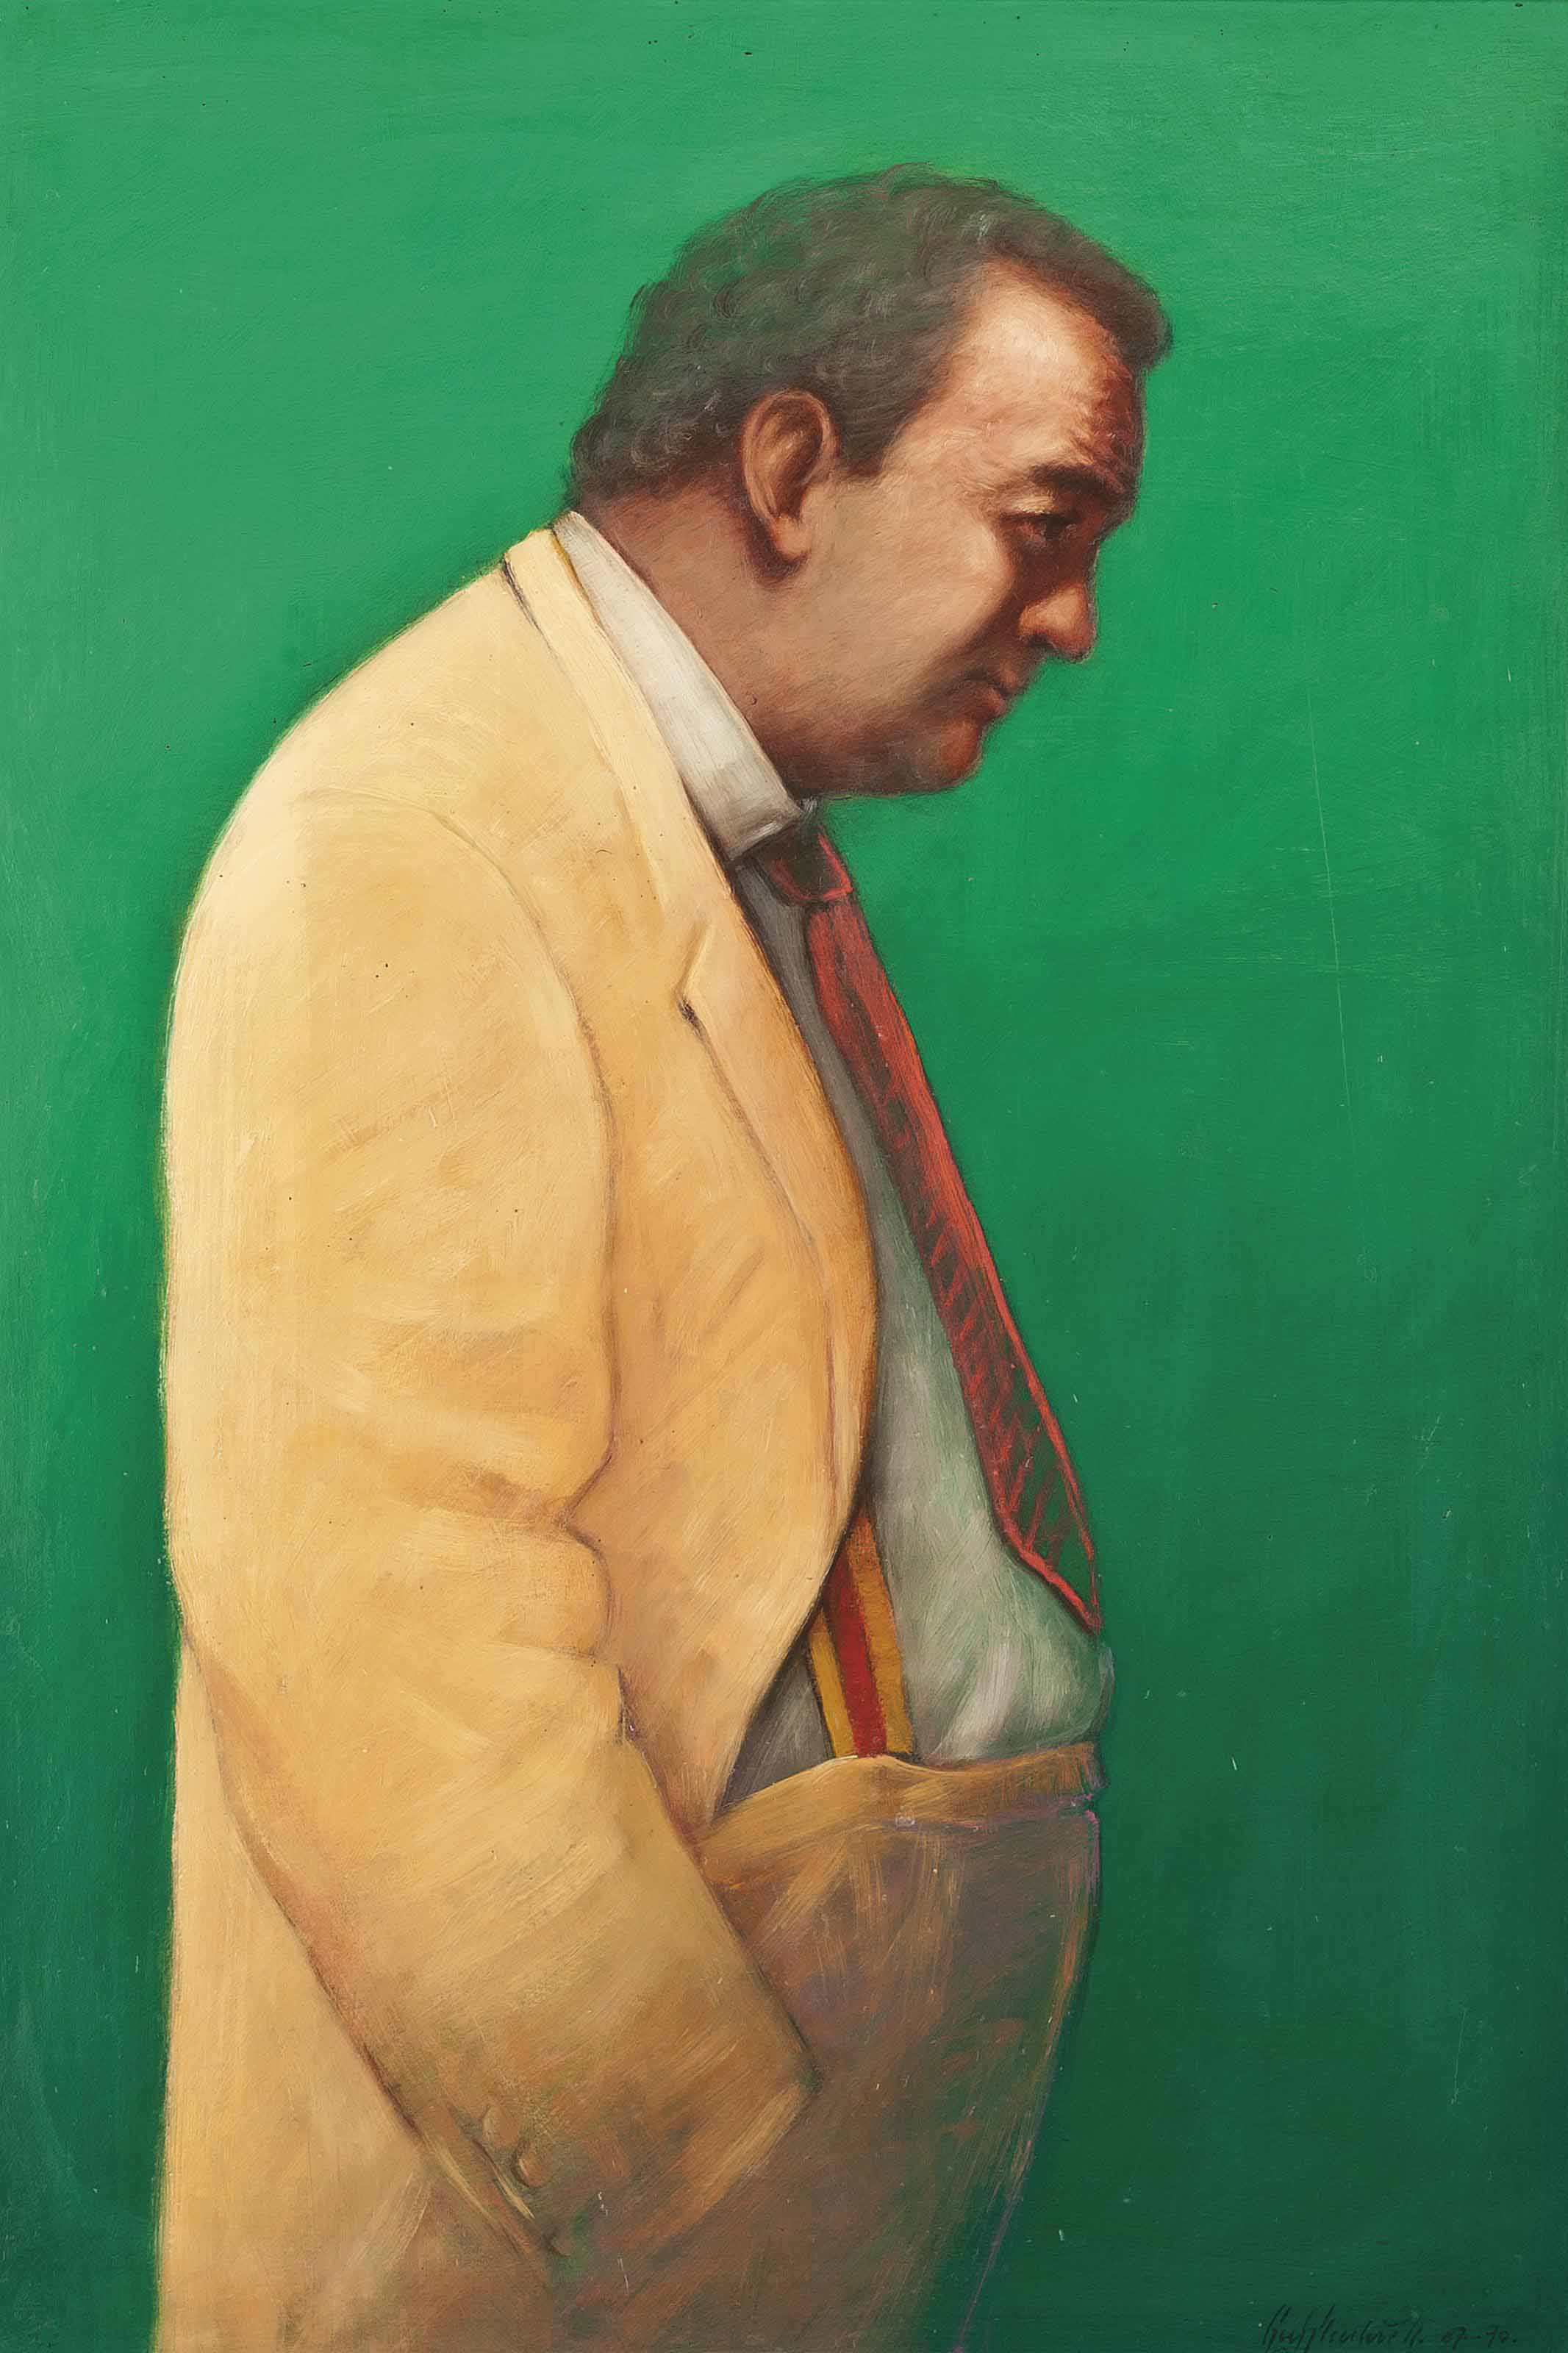 Portrait of Peter Langan